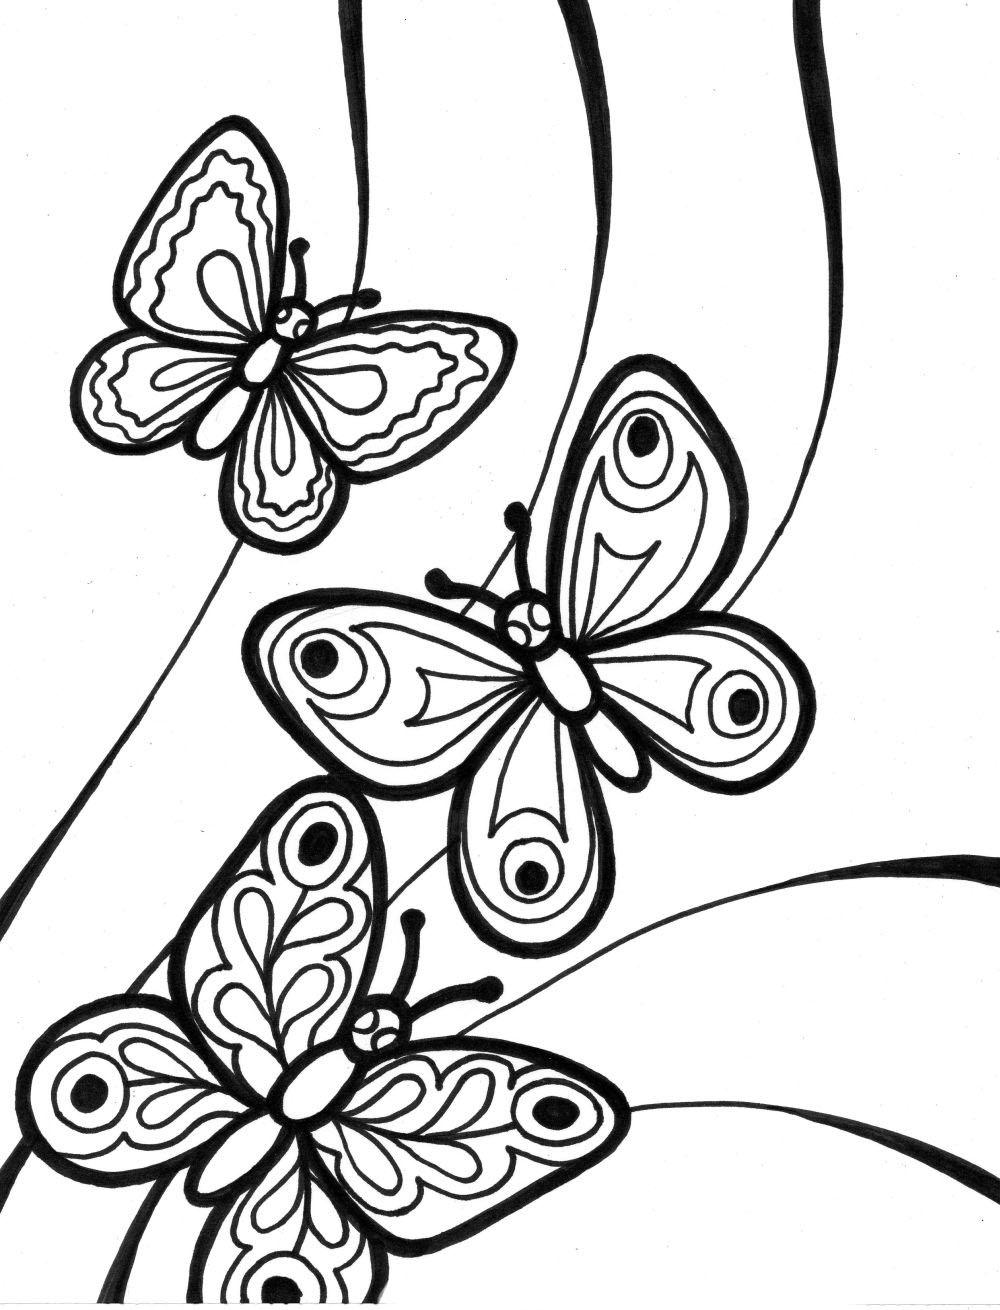 dibujos mariposas para colorear